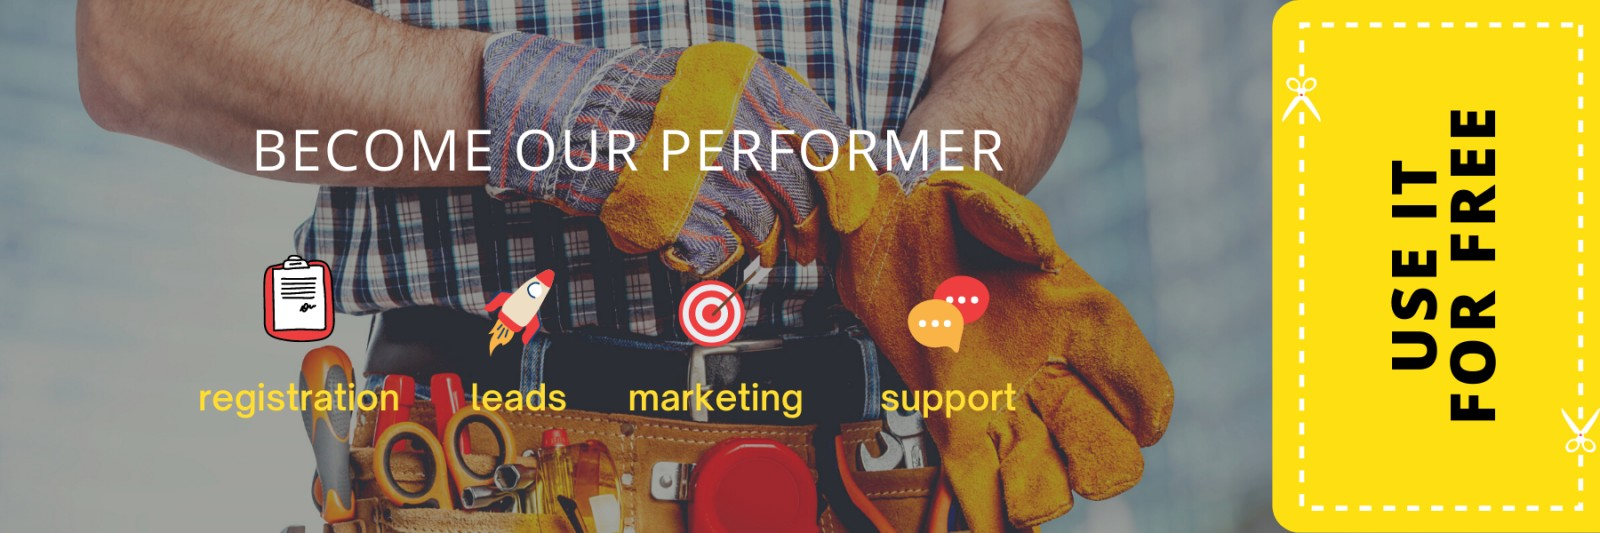 Fee4Bee performer benefits